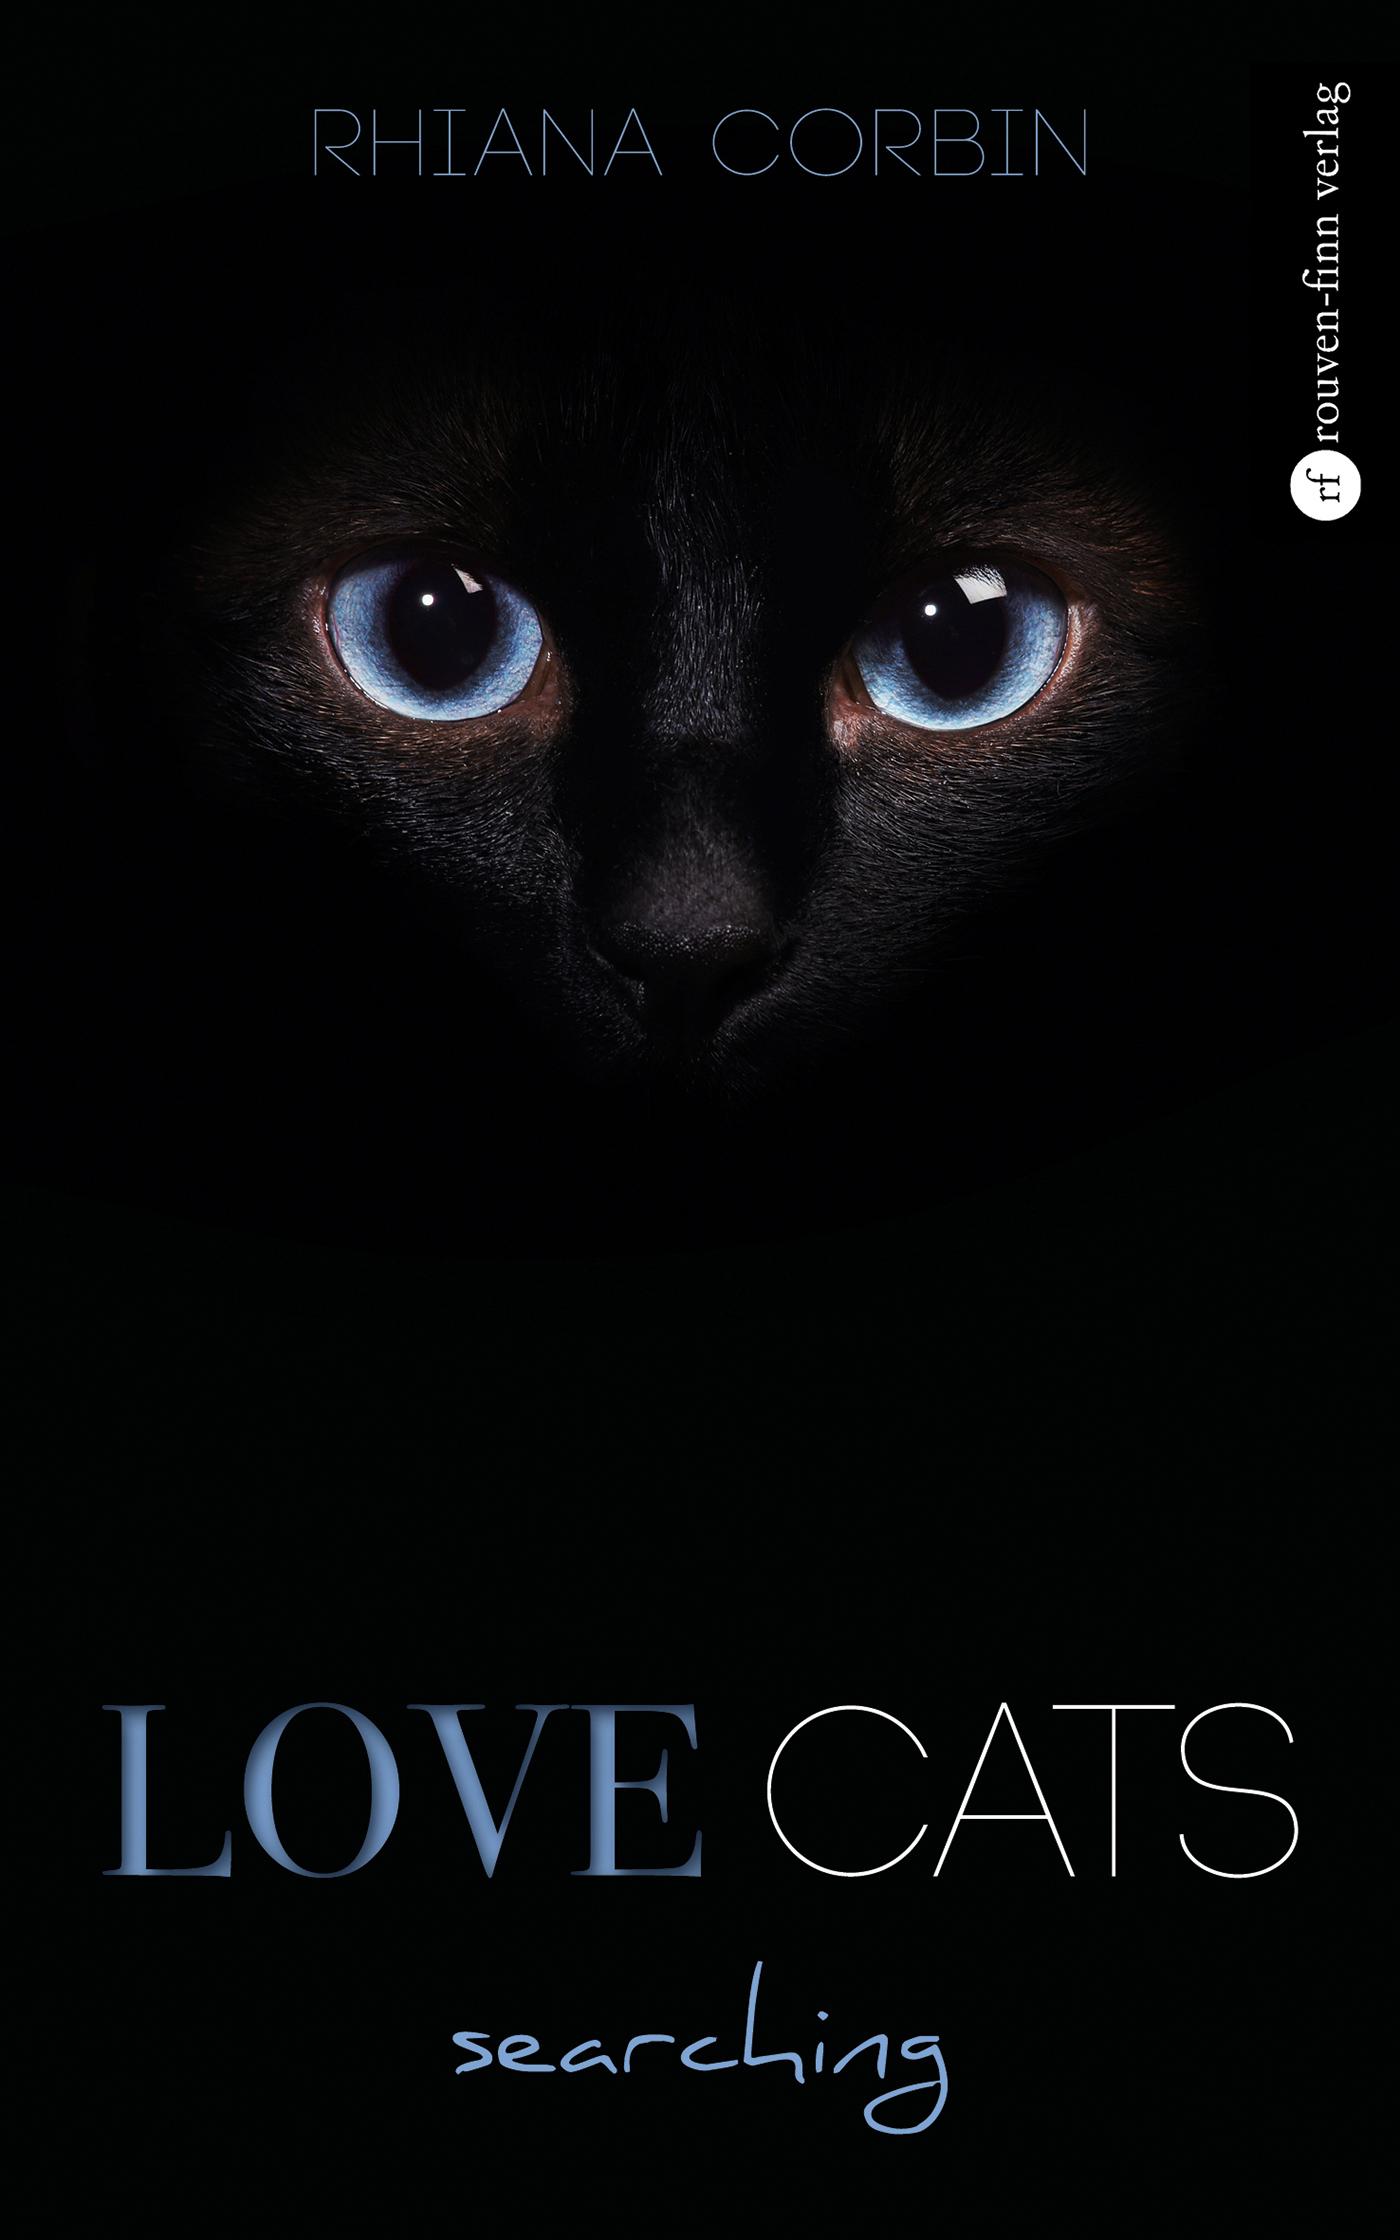 Love Cats searching ~ Rhiana Corbin ~  9783945744369